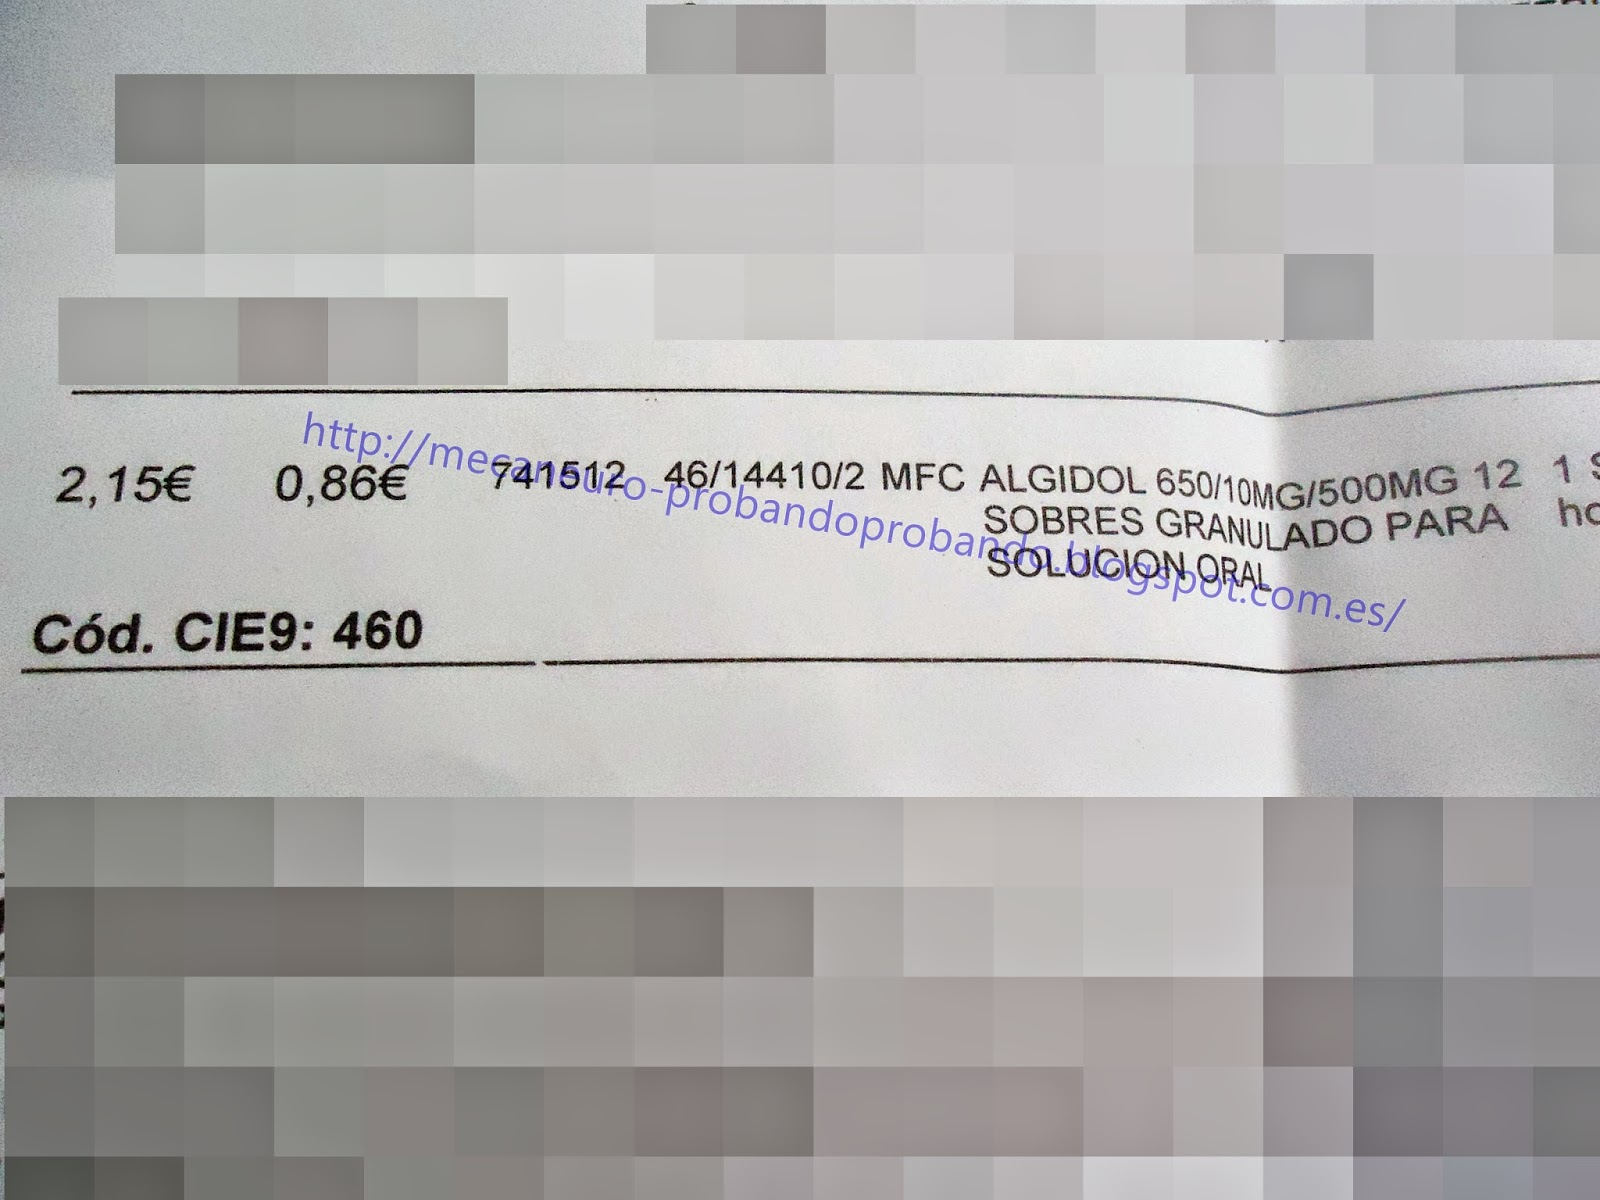 Algidol 650mg Granulado para solución oral receta